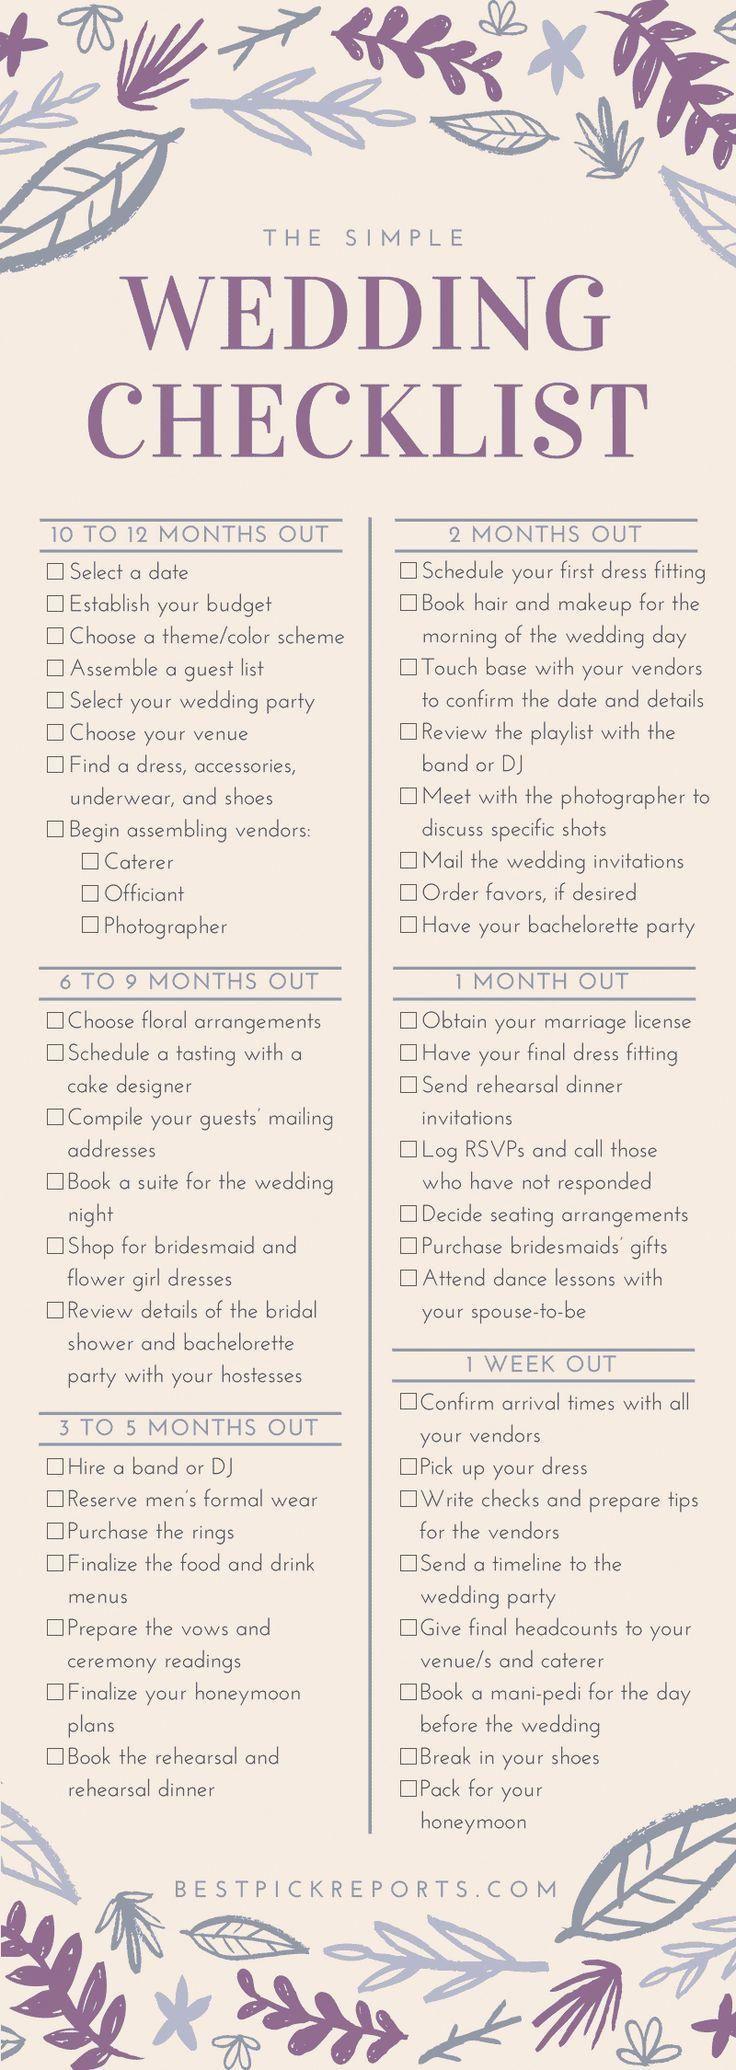 A Complete Checklist For A Simple Bride To Be Wedding Day Checklist Simplest We Simple Wedding Checklist Wedding Ceremony Checklist Wedding Day Checklist